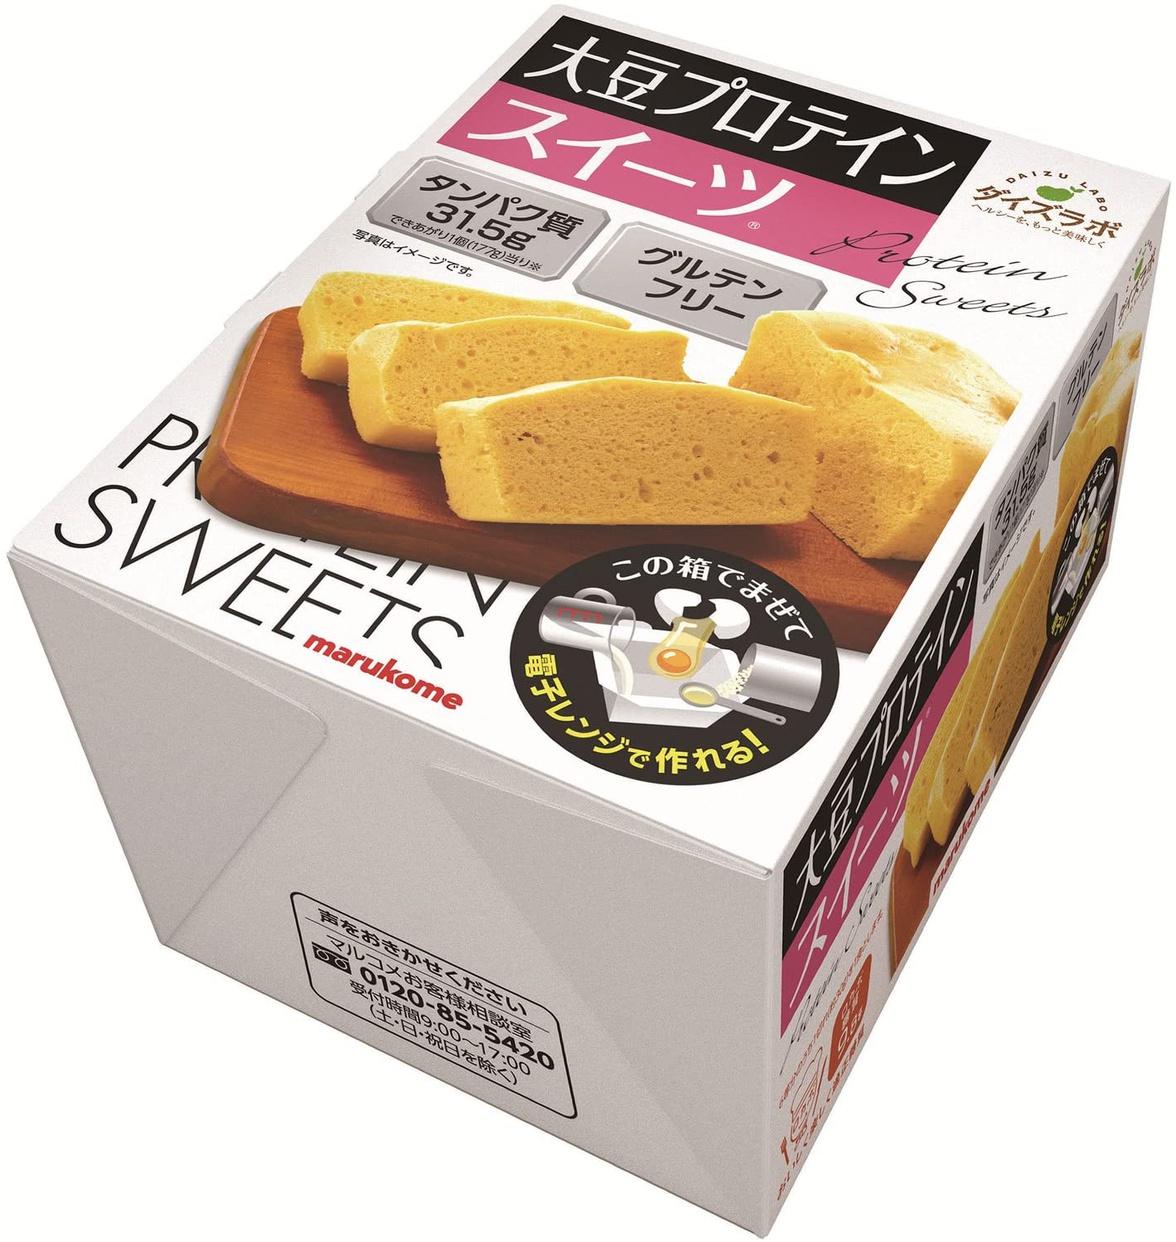 marukome(マルコメ) ダイズラボ 大豆プロテインスイーツの商品画像3